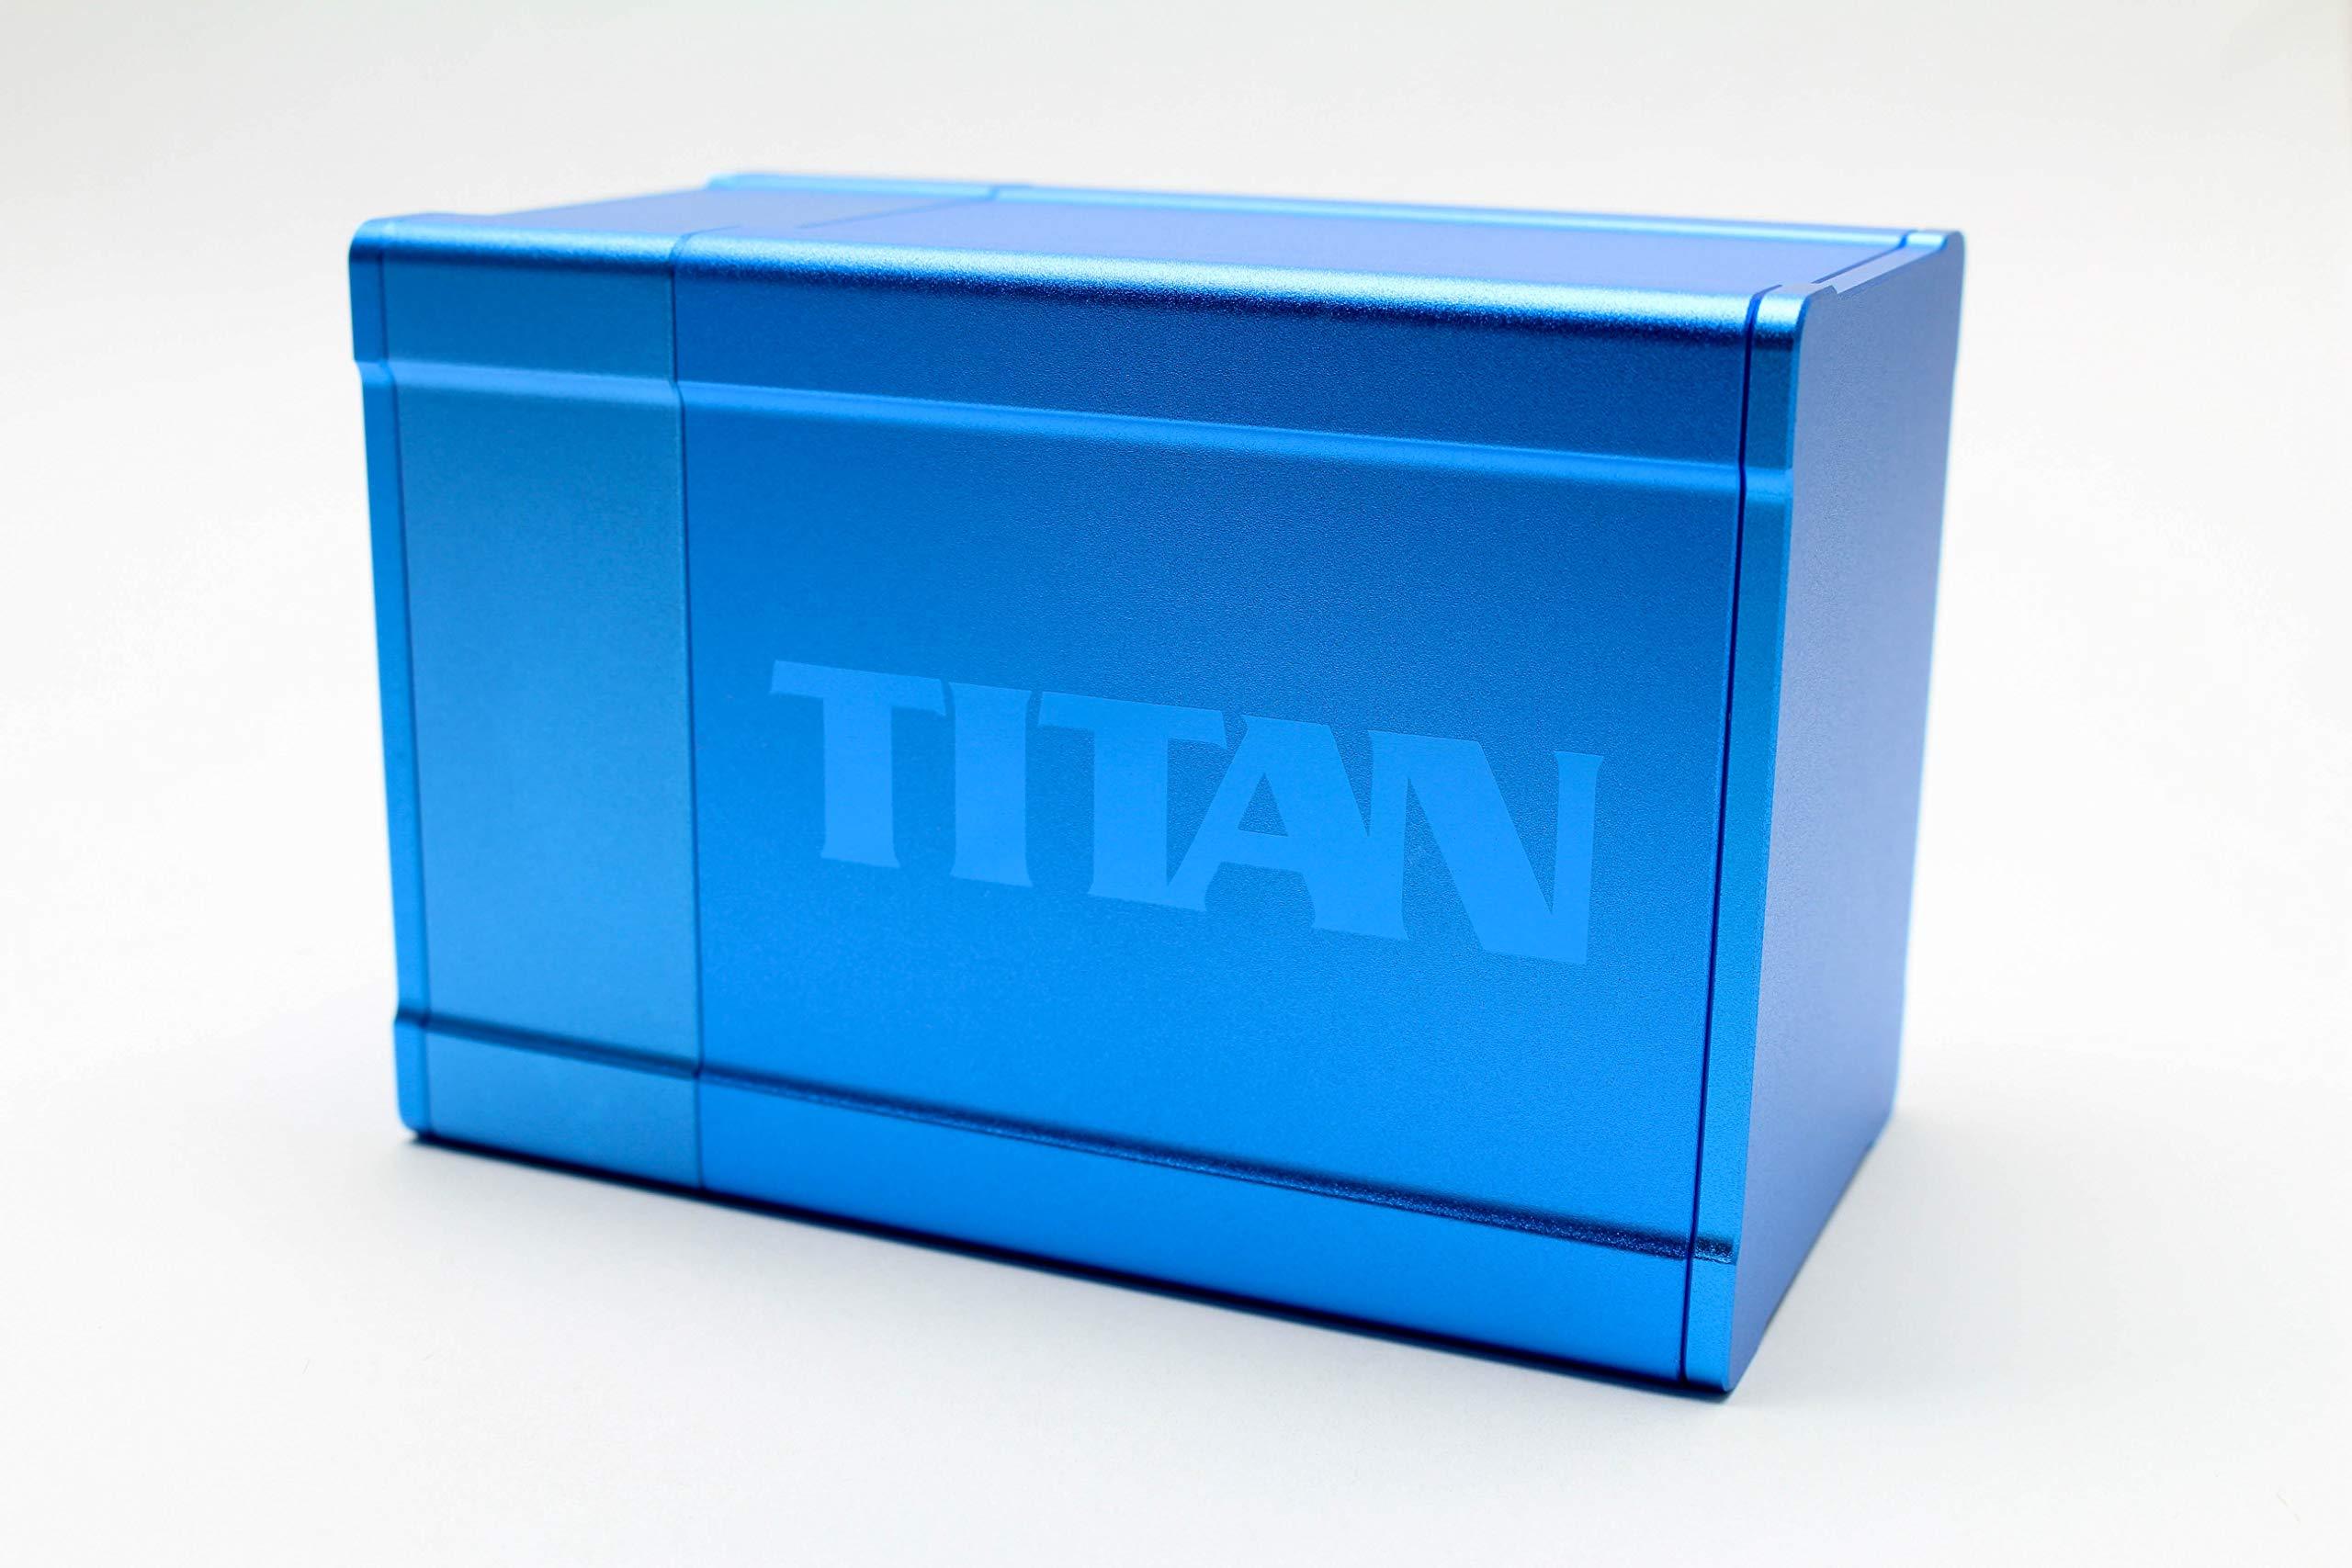 Blue Satin Titan Solid Box Gods Premium High Strength Deck Box Case Protector